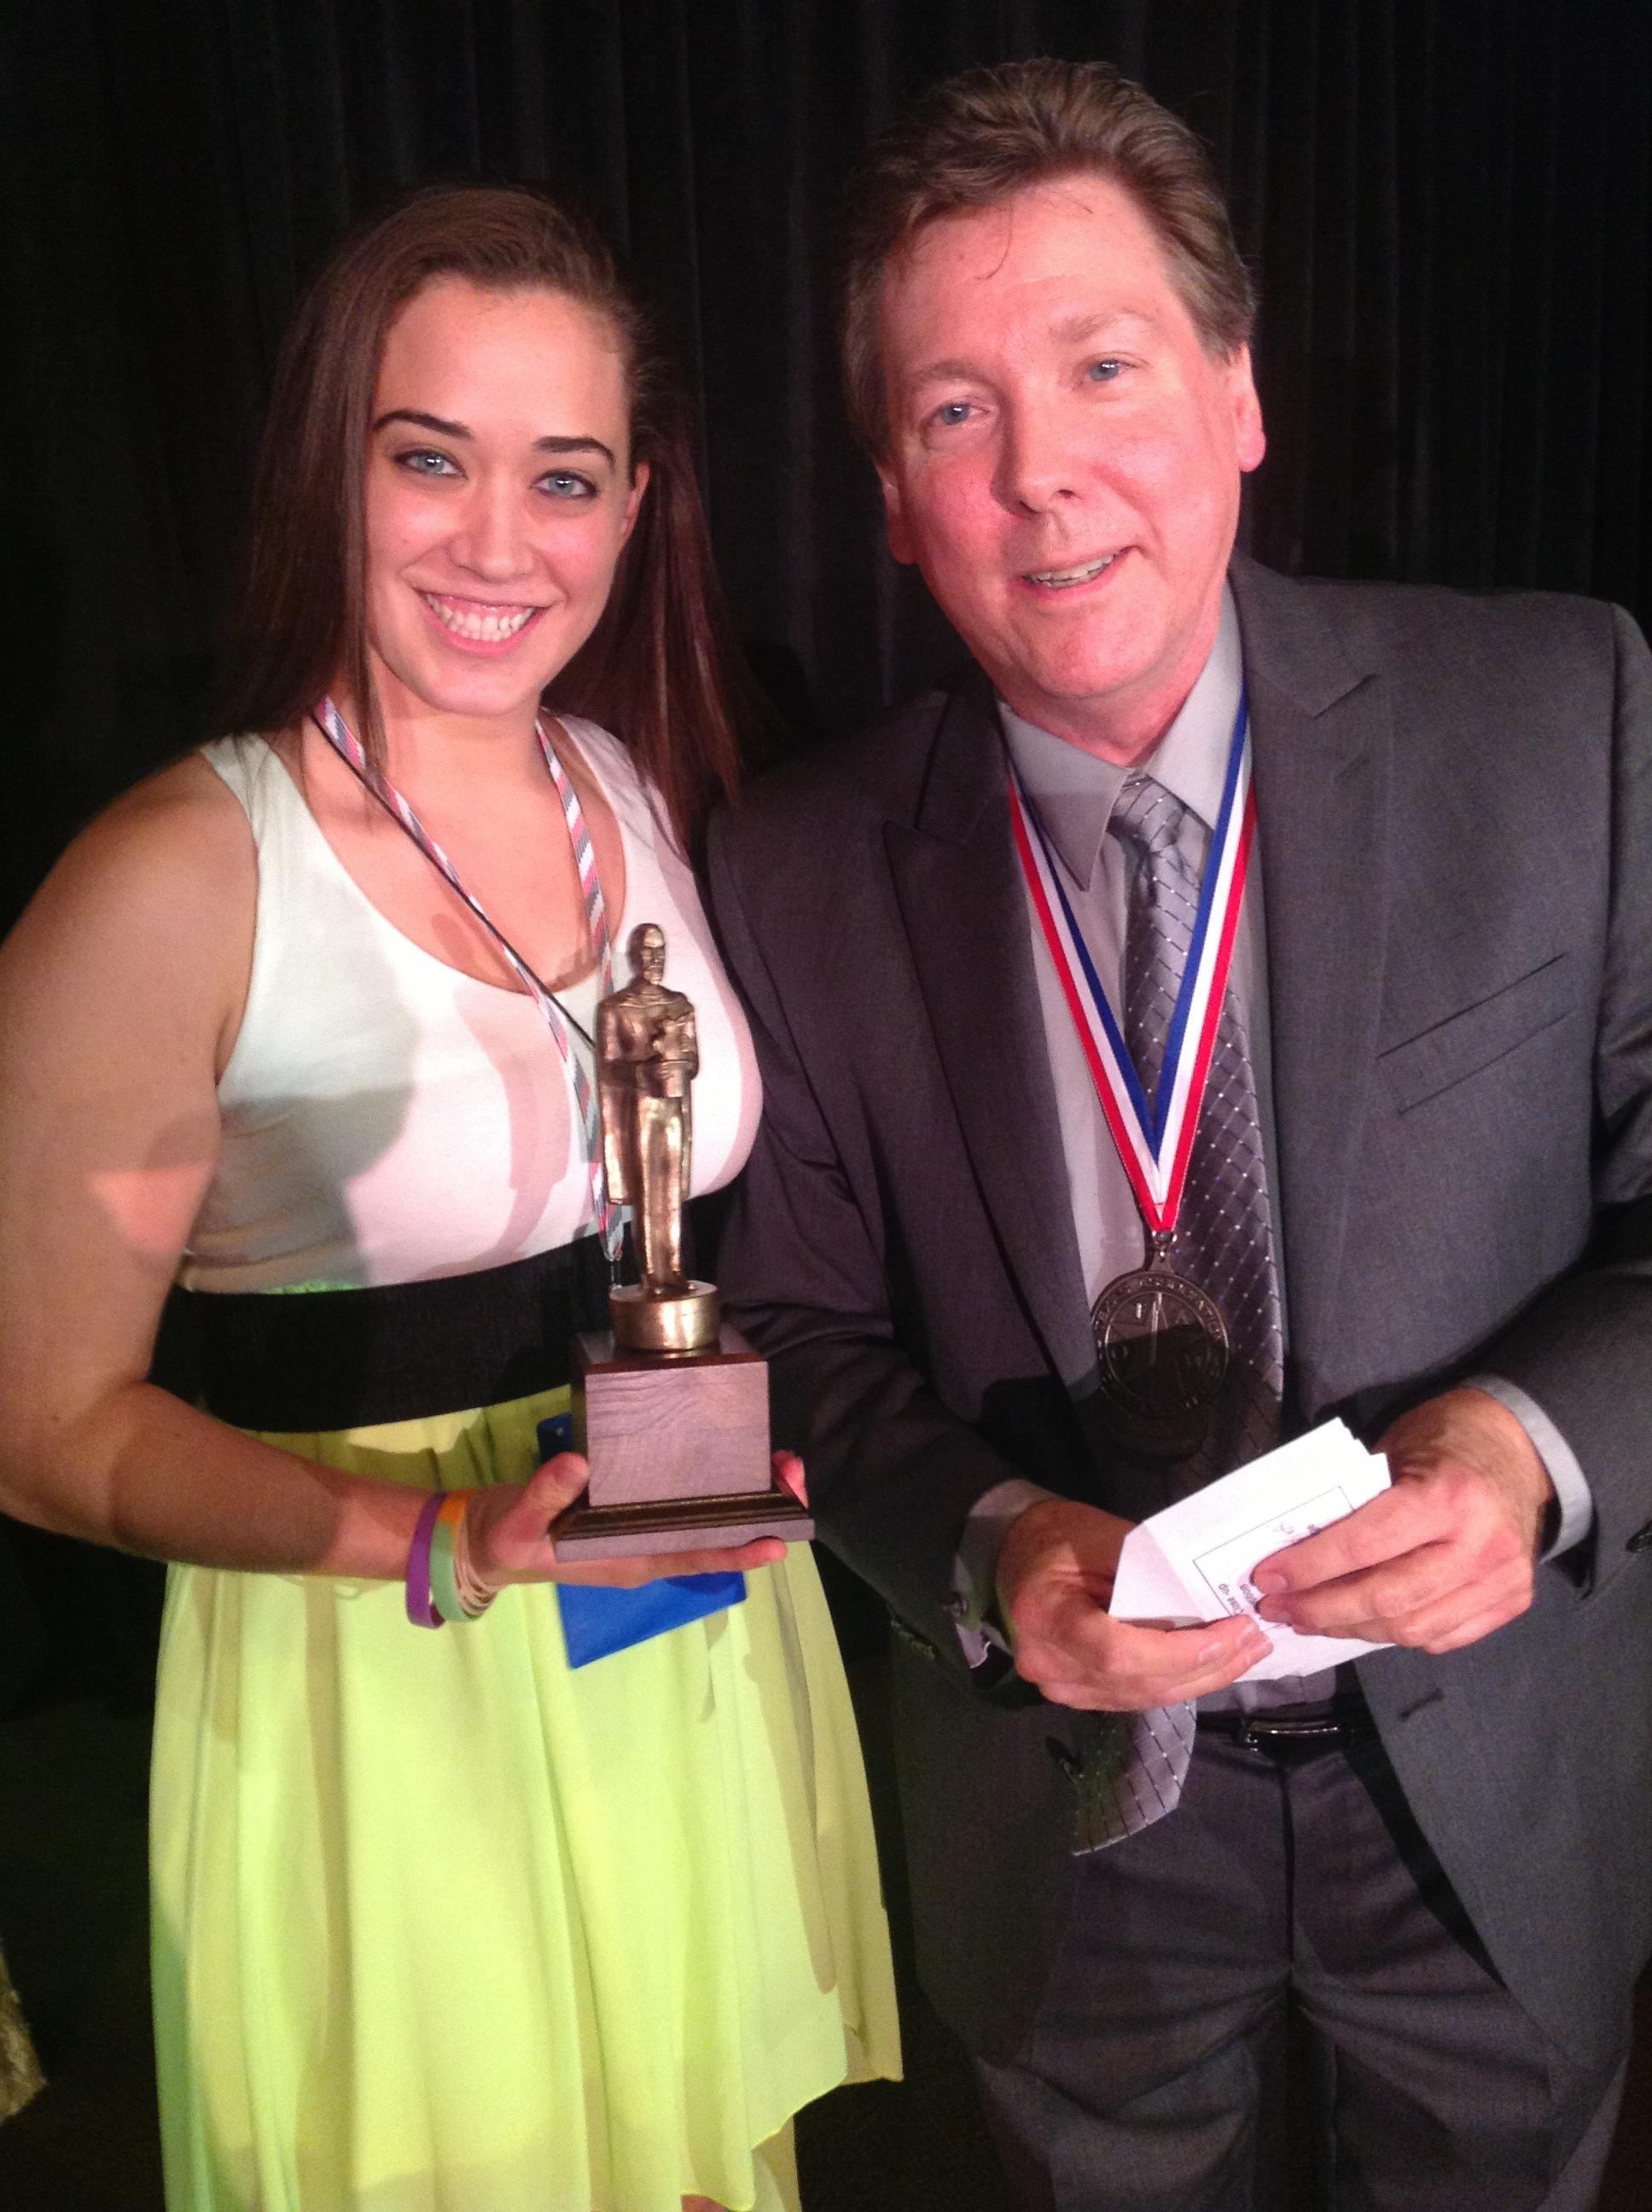 Kayla Drescher and Bob Emory